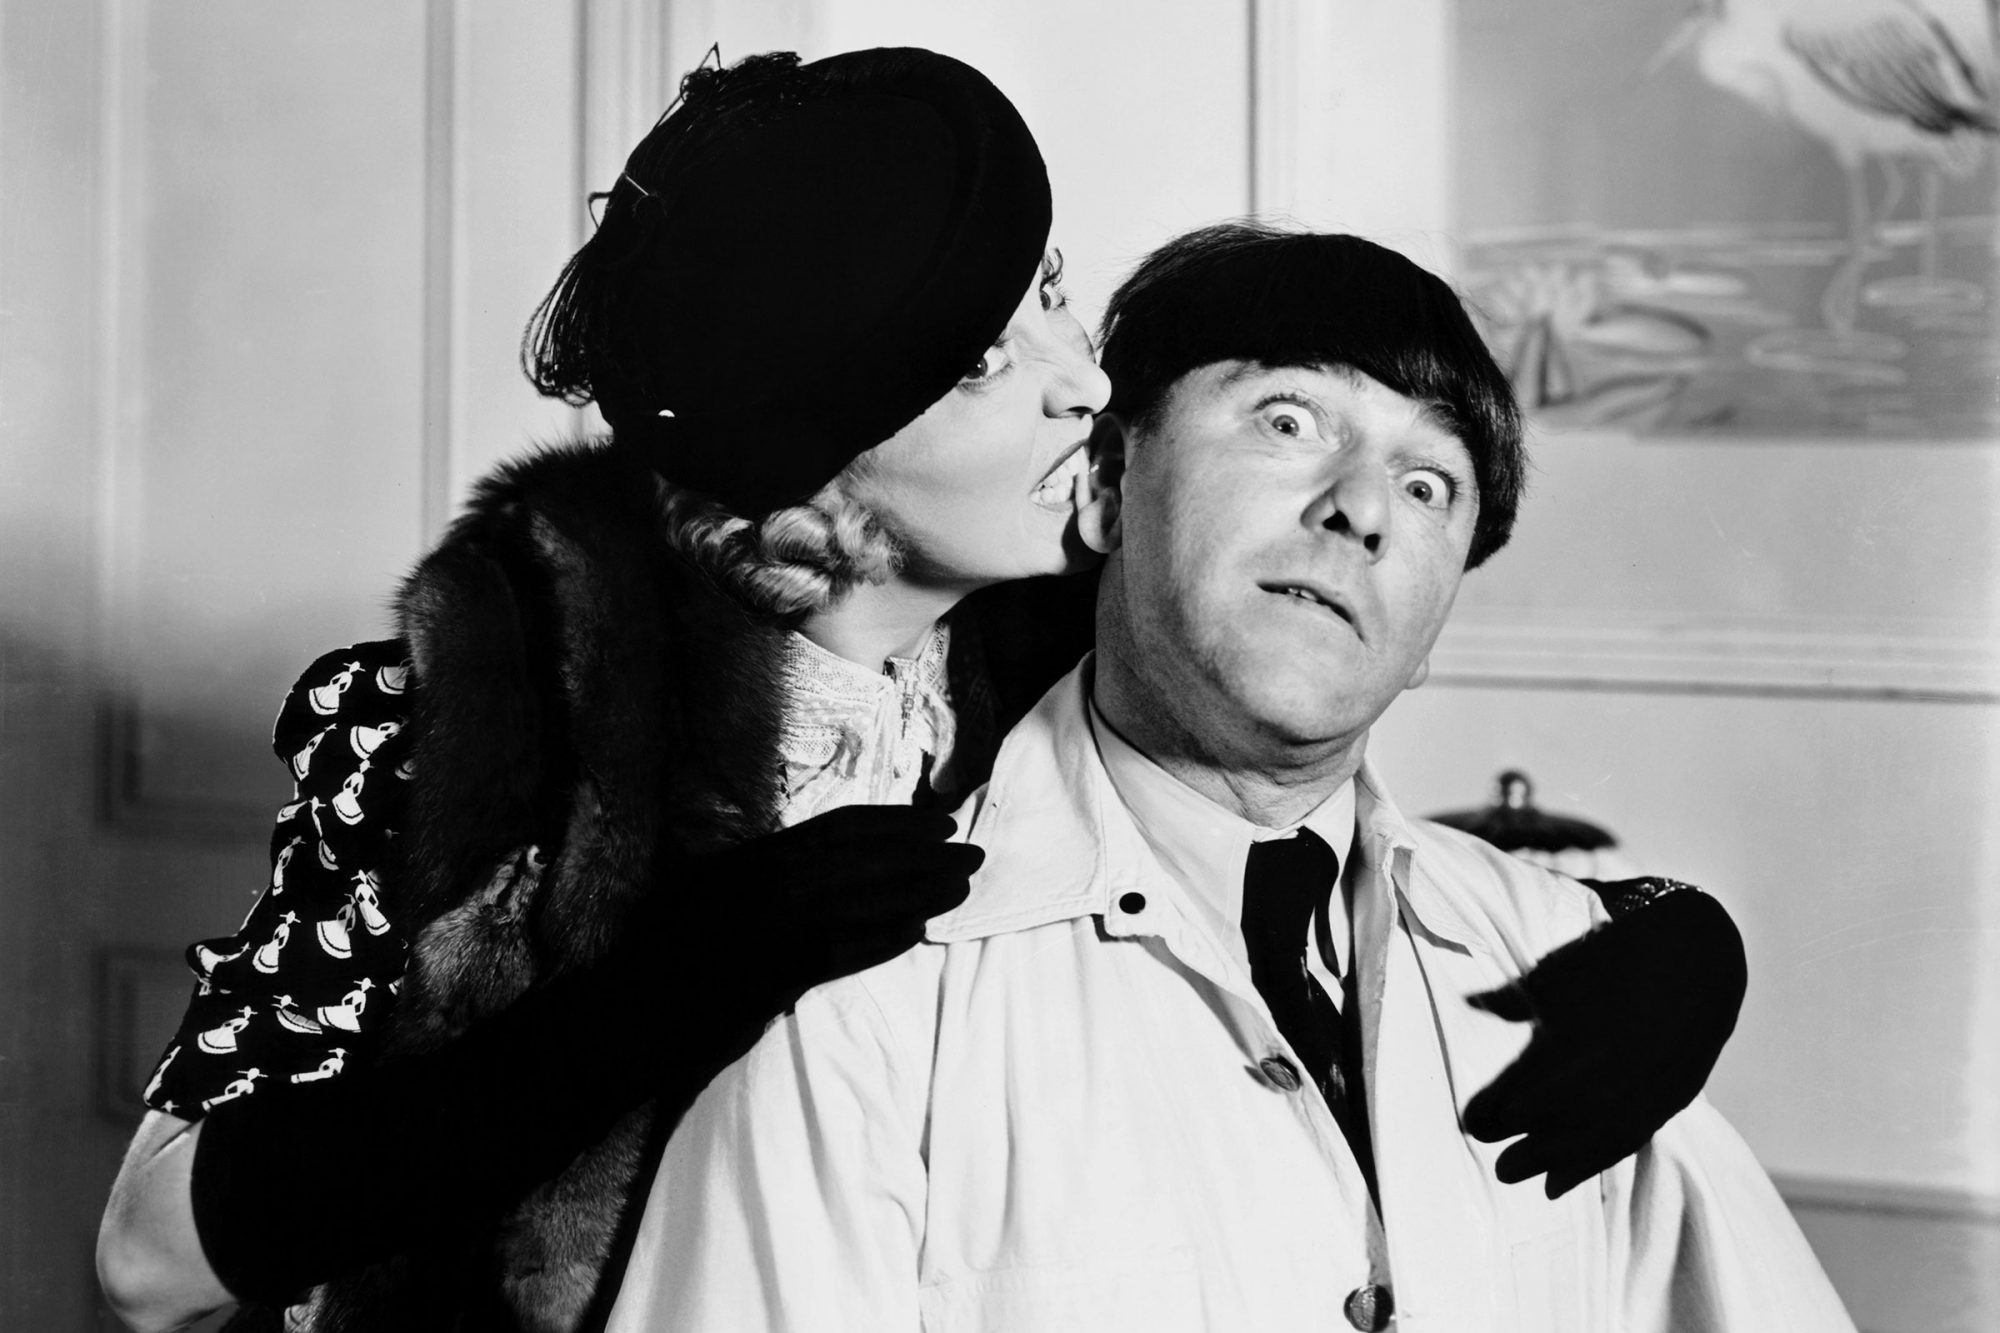 TASSELS IN THE AIR, from left, Gertrude Astor, Moe Howard, 1938